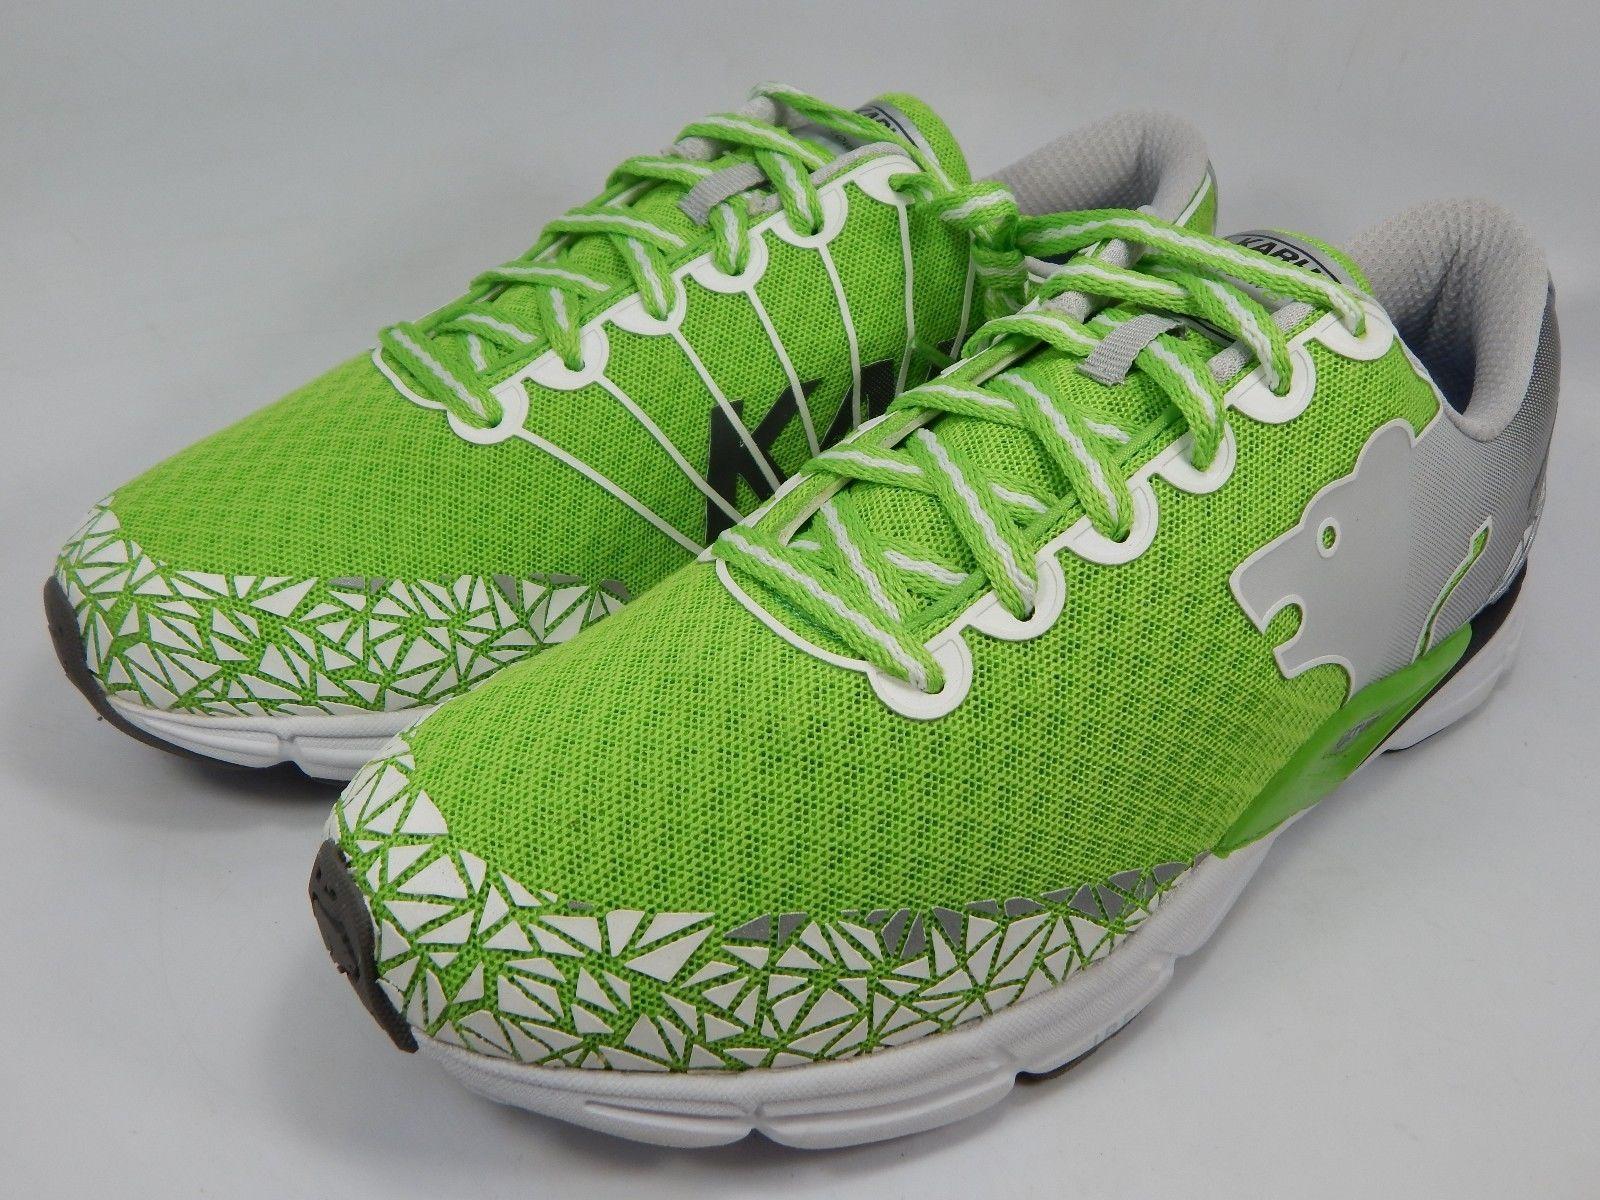 Karhu Flow 6 IRE Fulcrum Men's Running Shoes Size US 9 M (D) EU 42 Green White